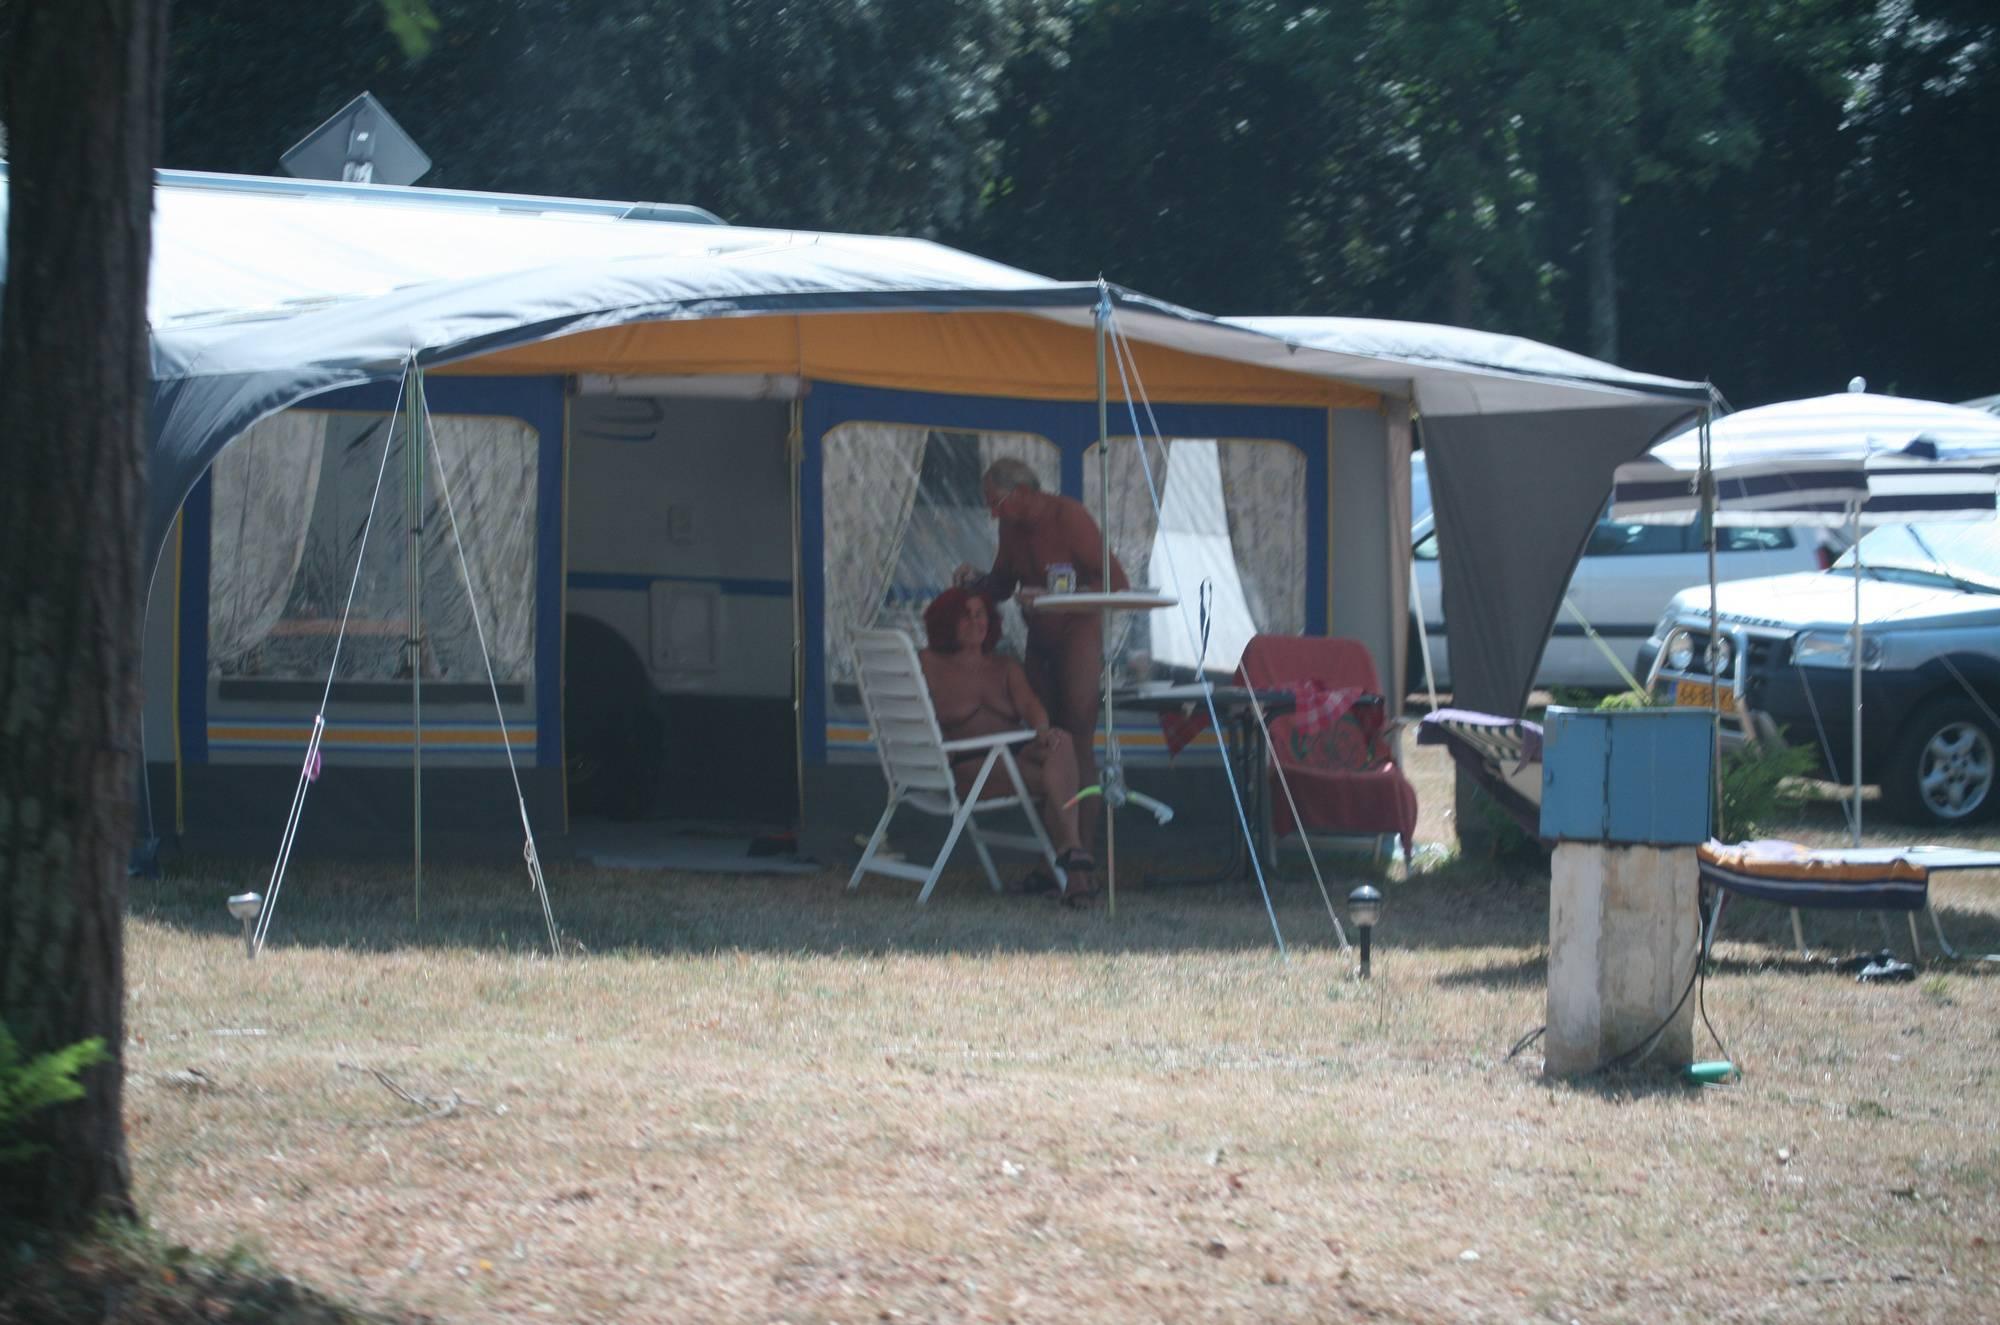 Pure Nudism Pics-Avila FKK Camping Ground - 3